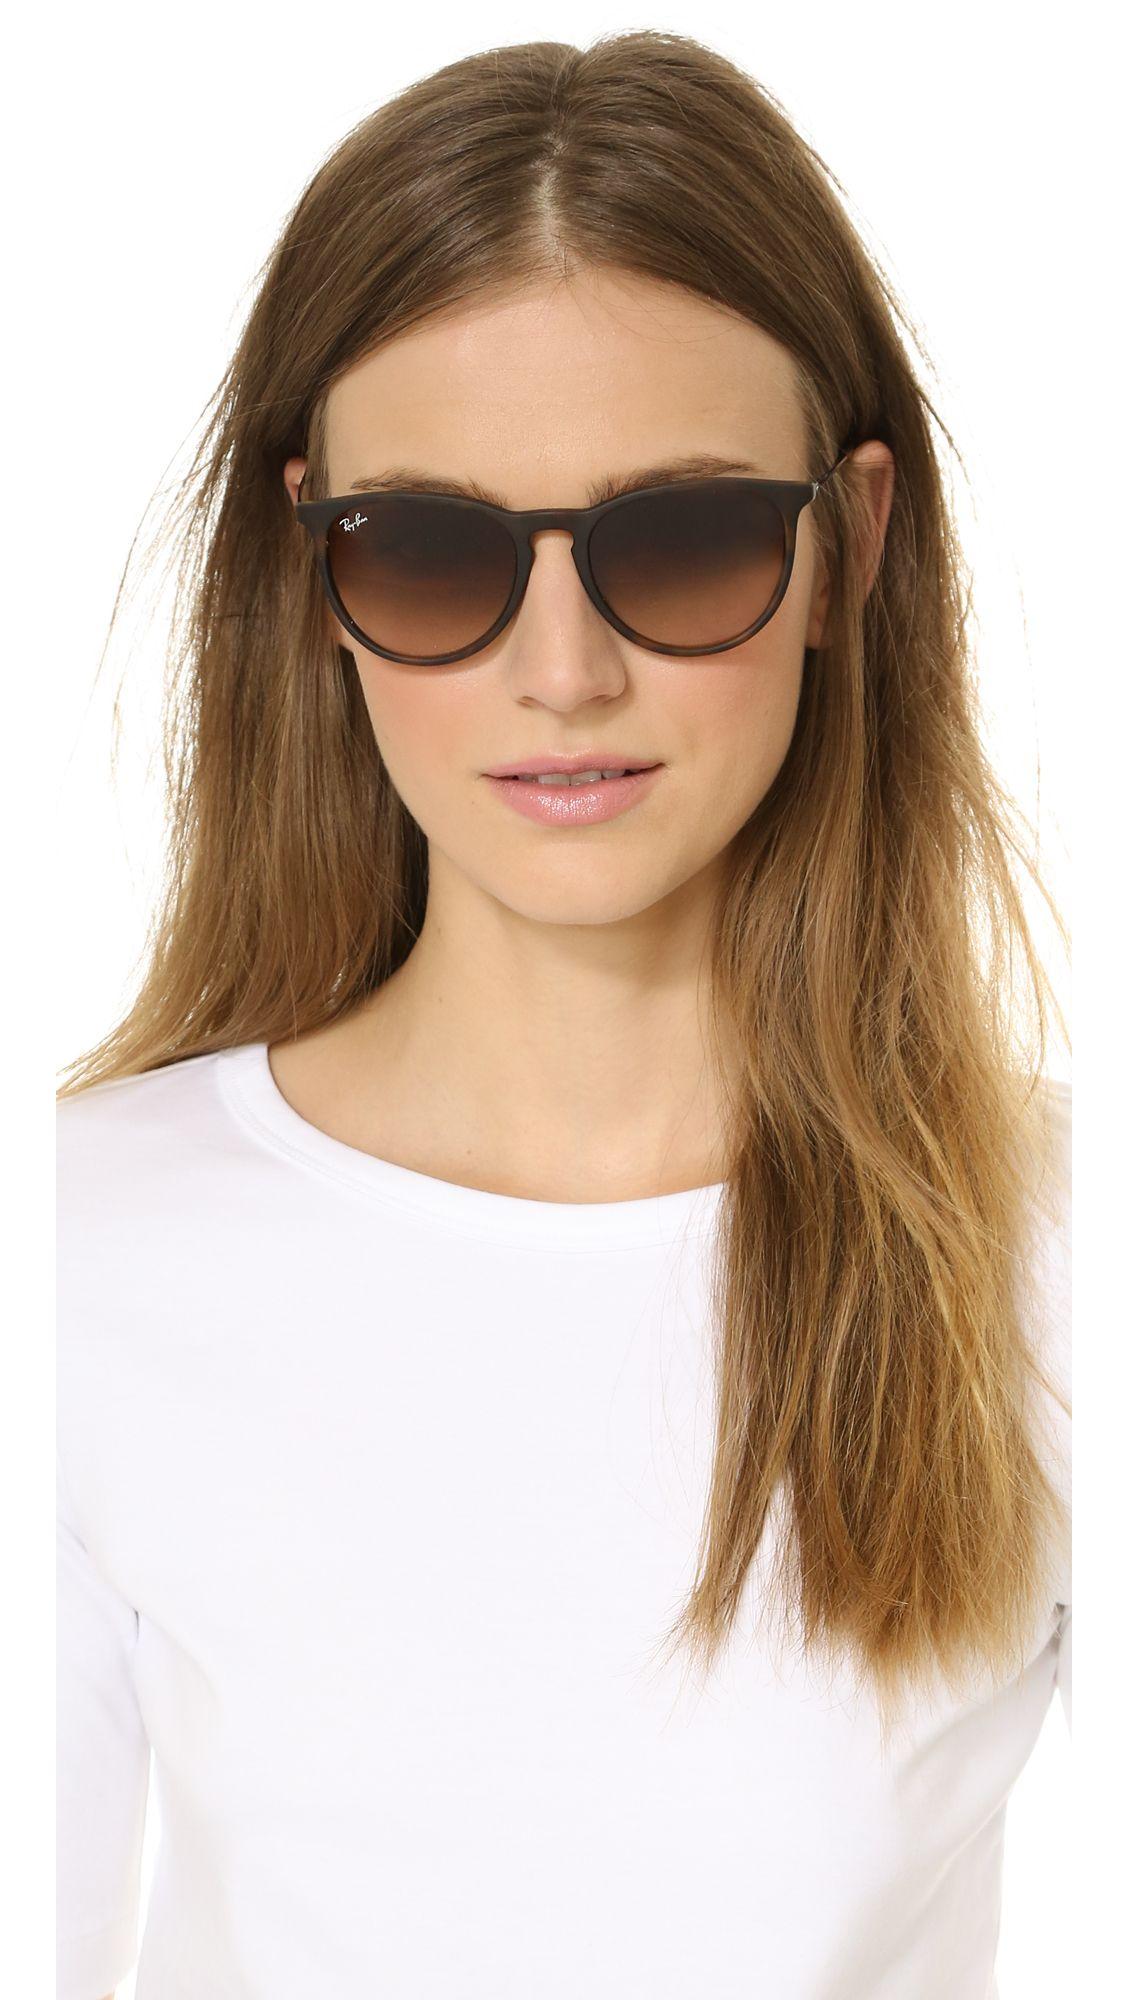 ray ban erika sunglasses sand  erika sunglasses. rayban